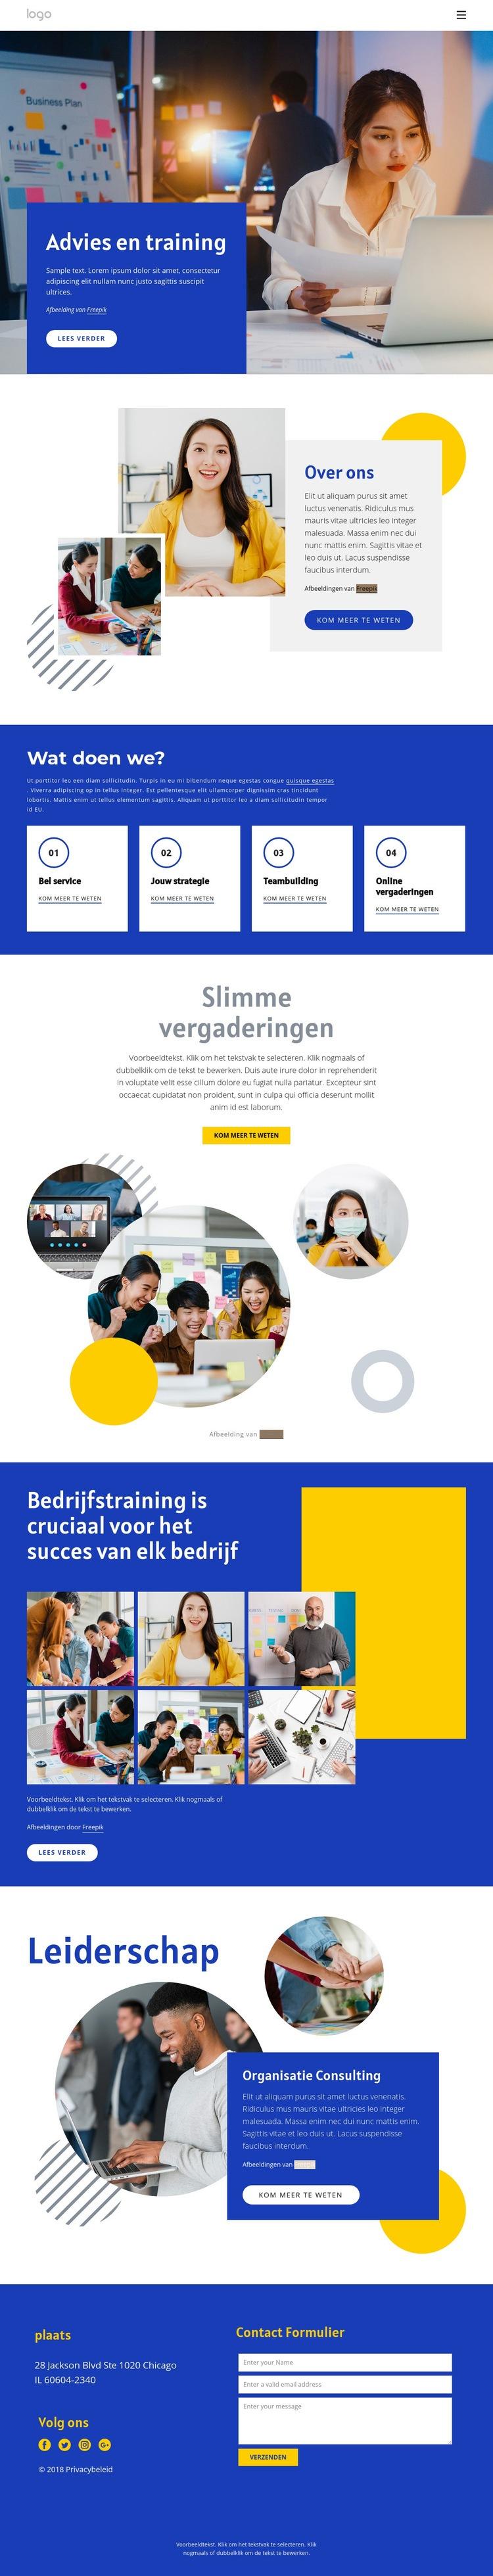 Advies en training Website sjabloon